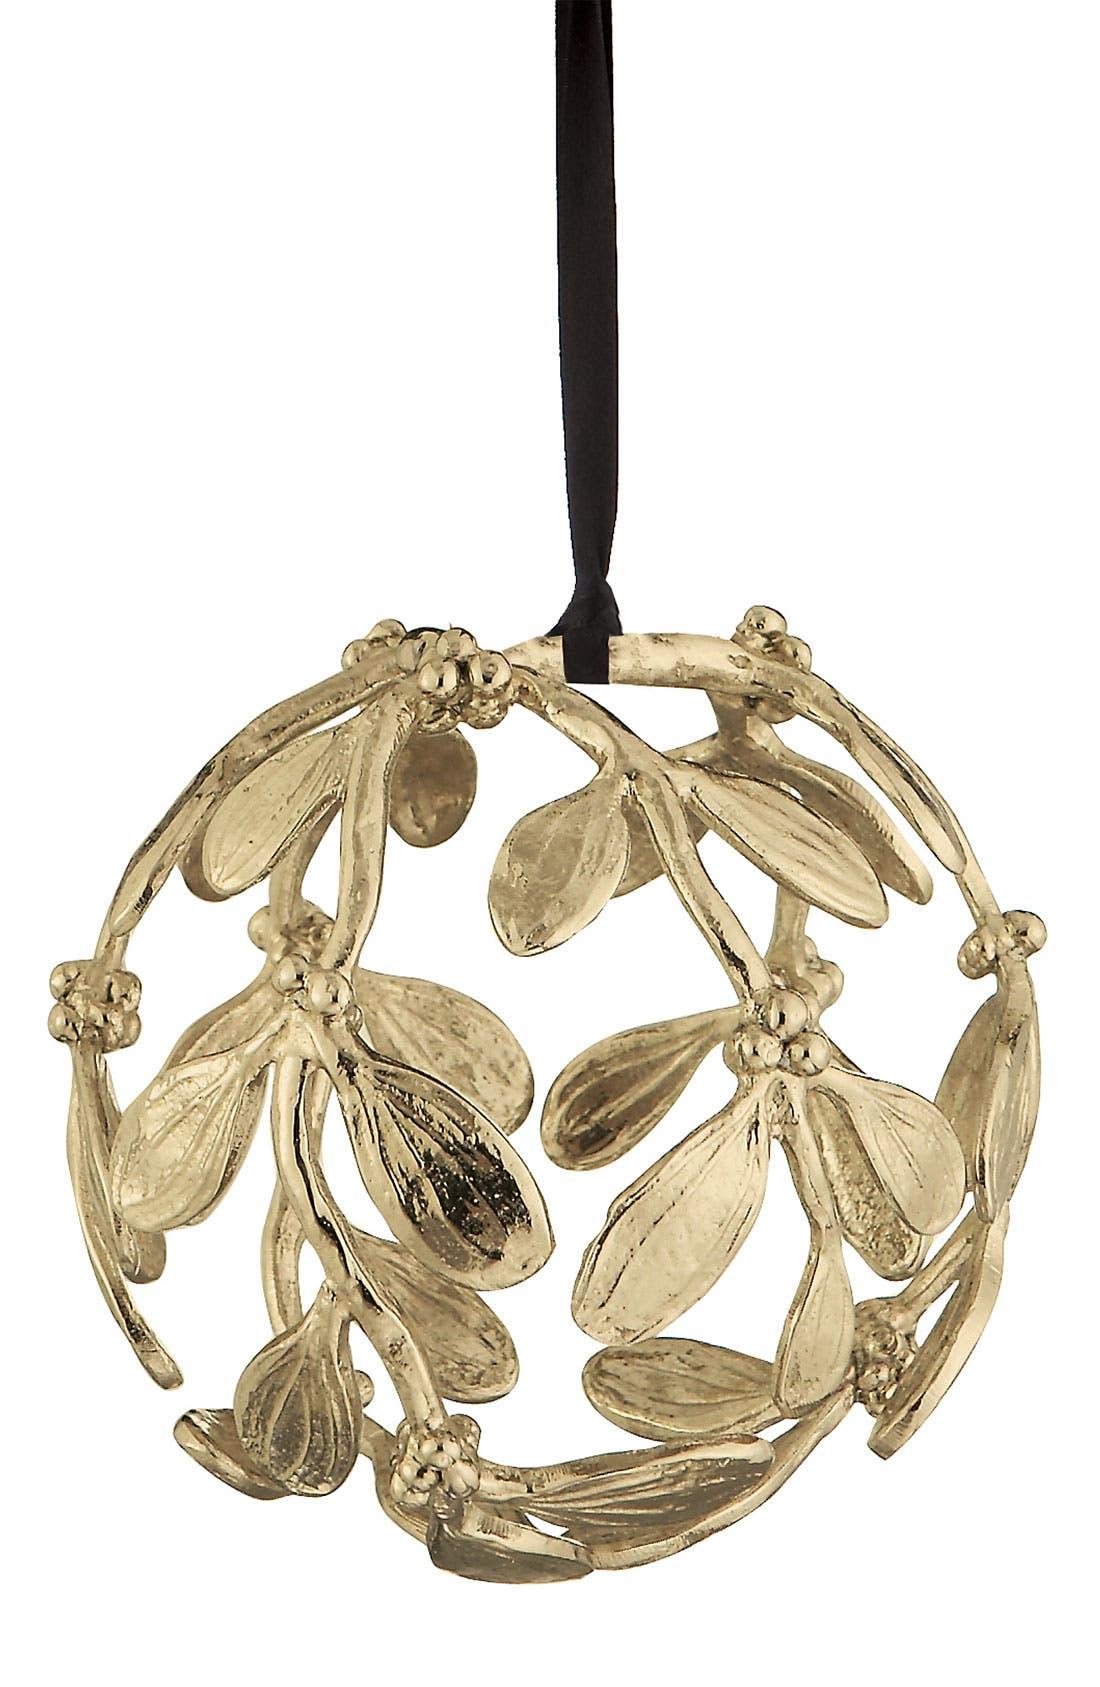 Alternate Image 1 Selected - Michael Aram Mistletoe Globe Ornament